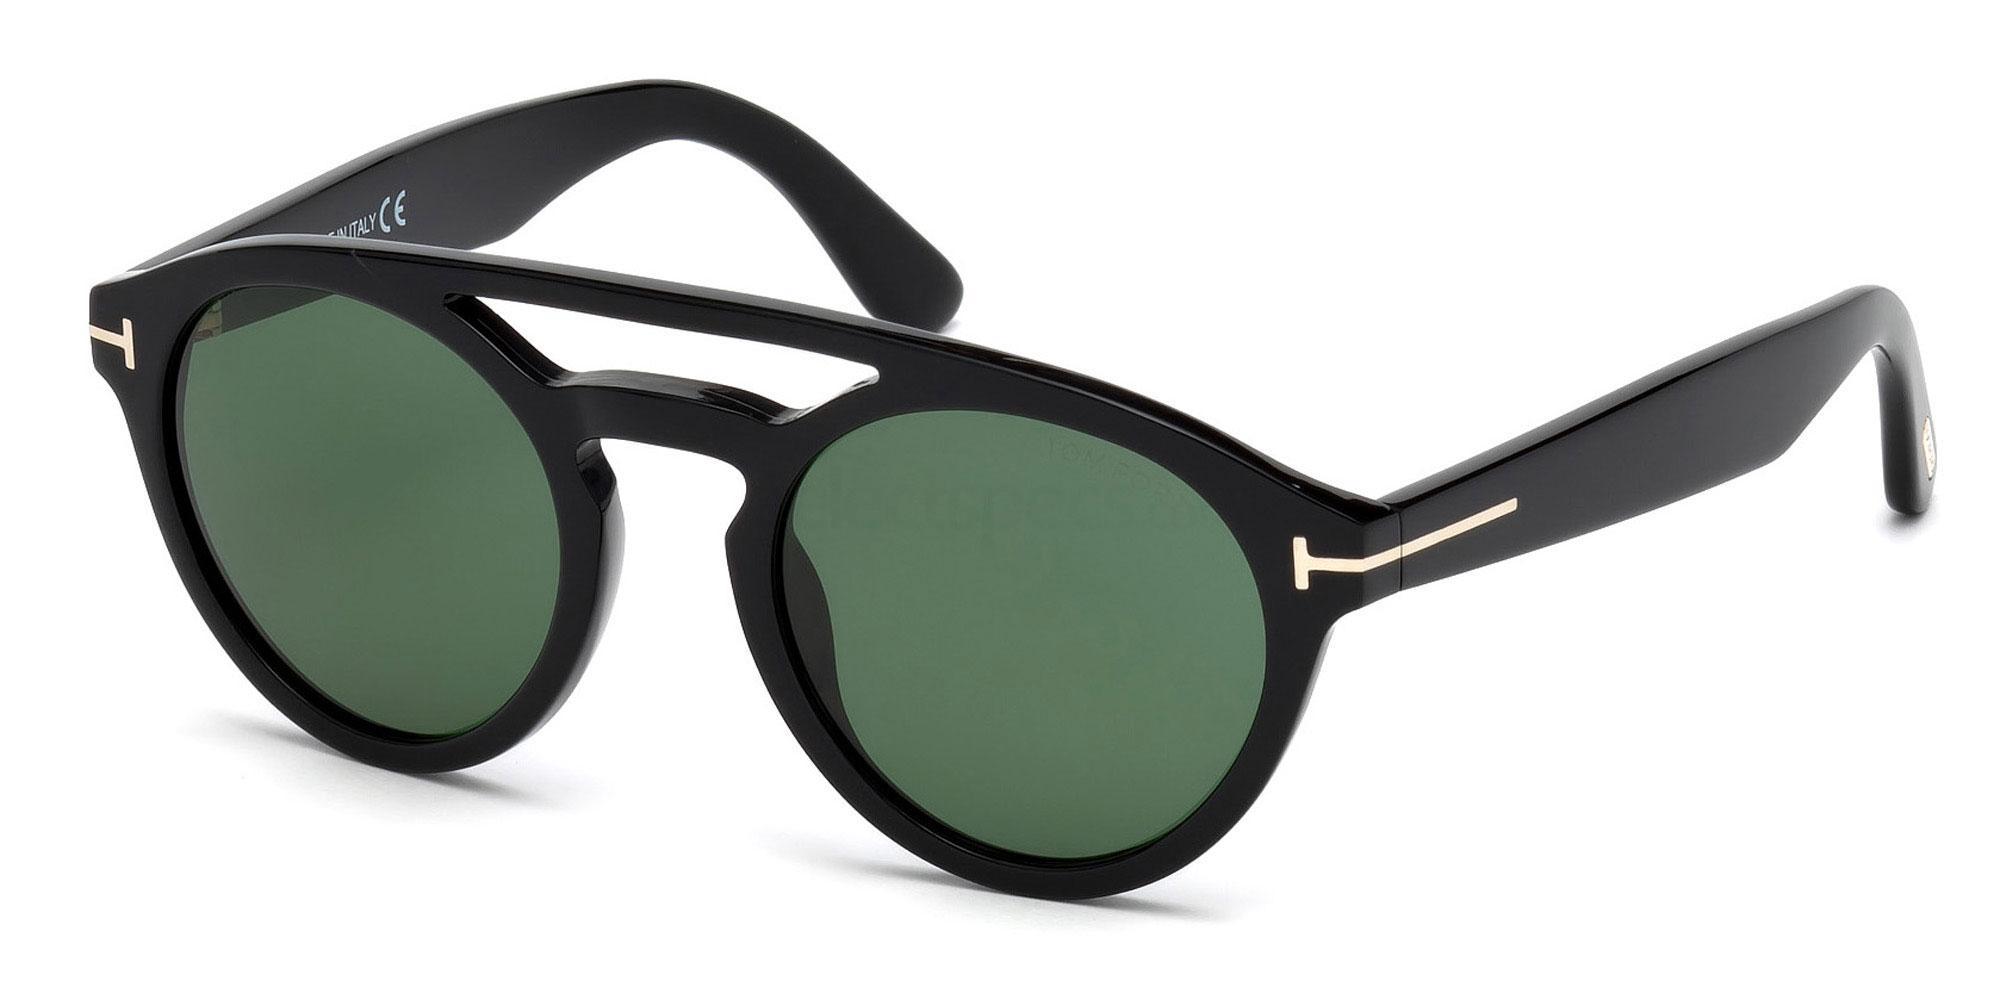 01N FT0537 Sunglasses, Tom Ford